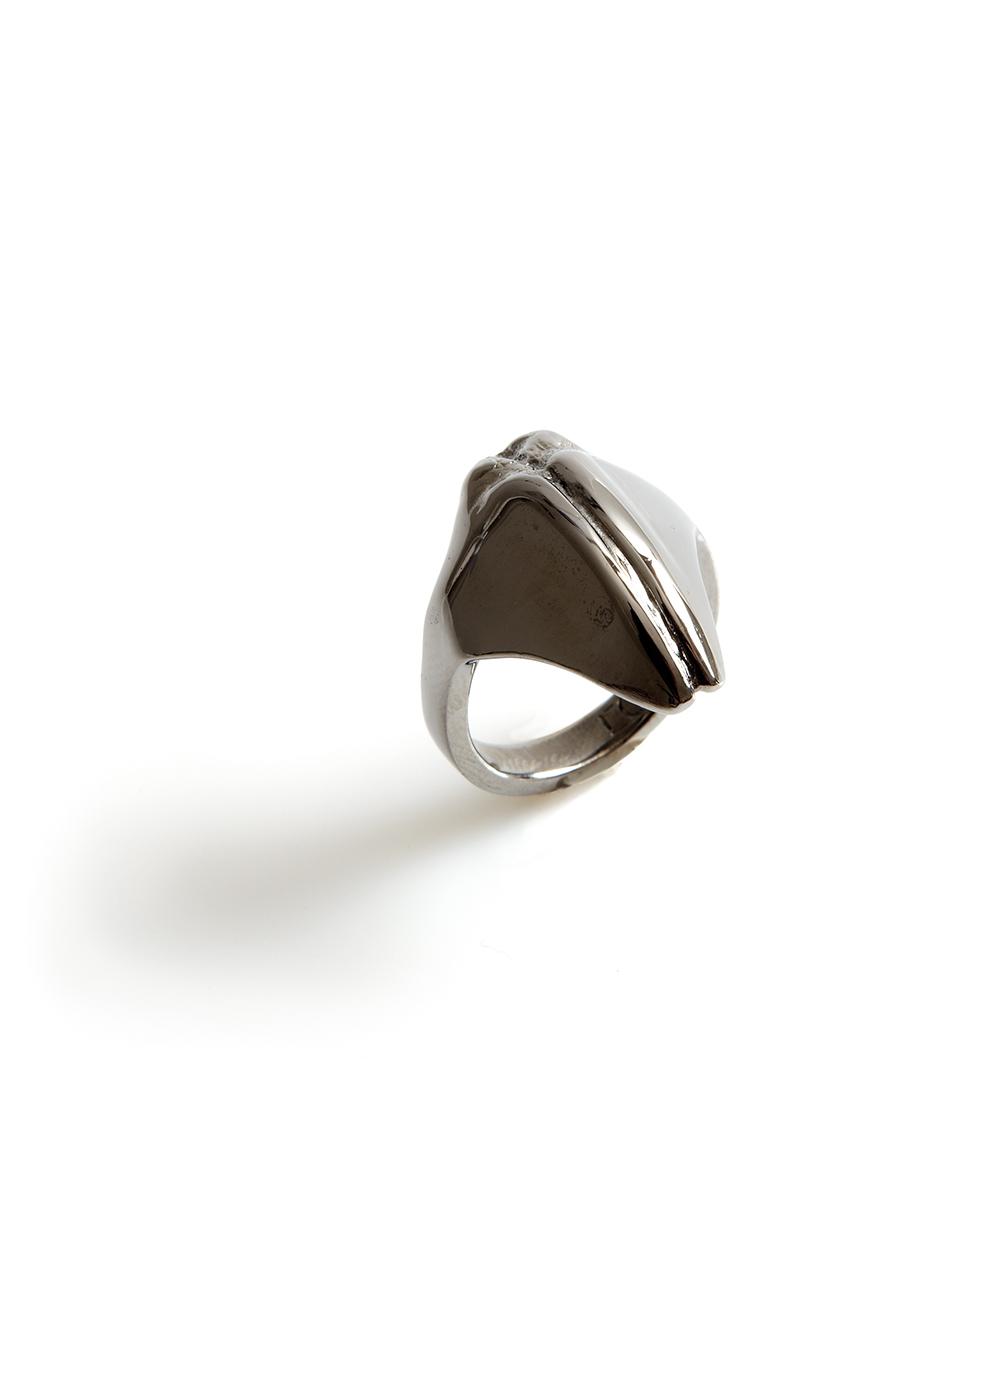 mandibile ring2, black rhodanized